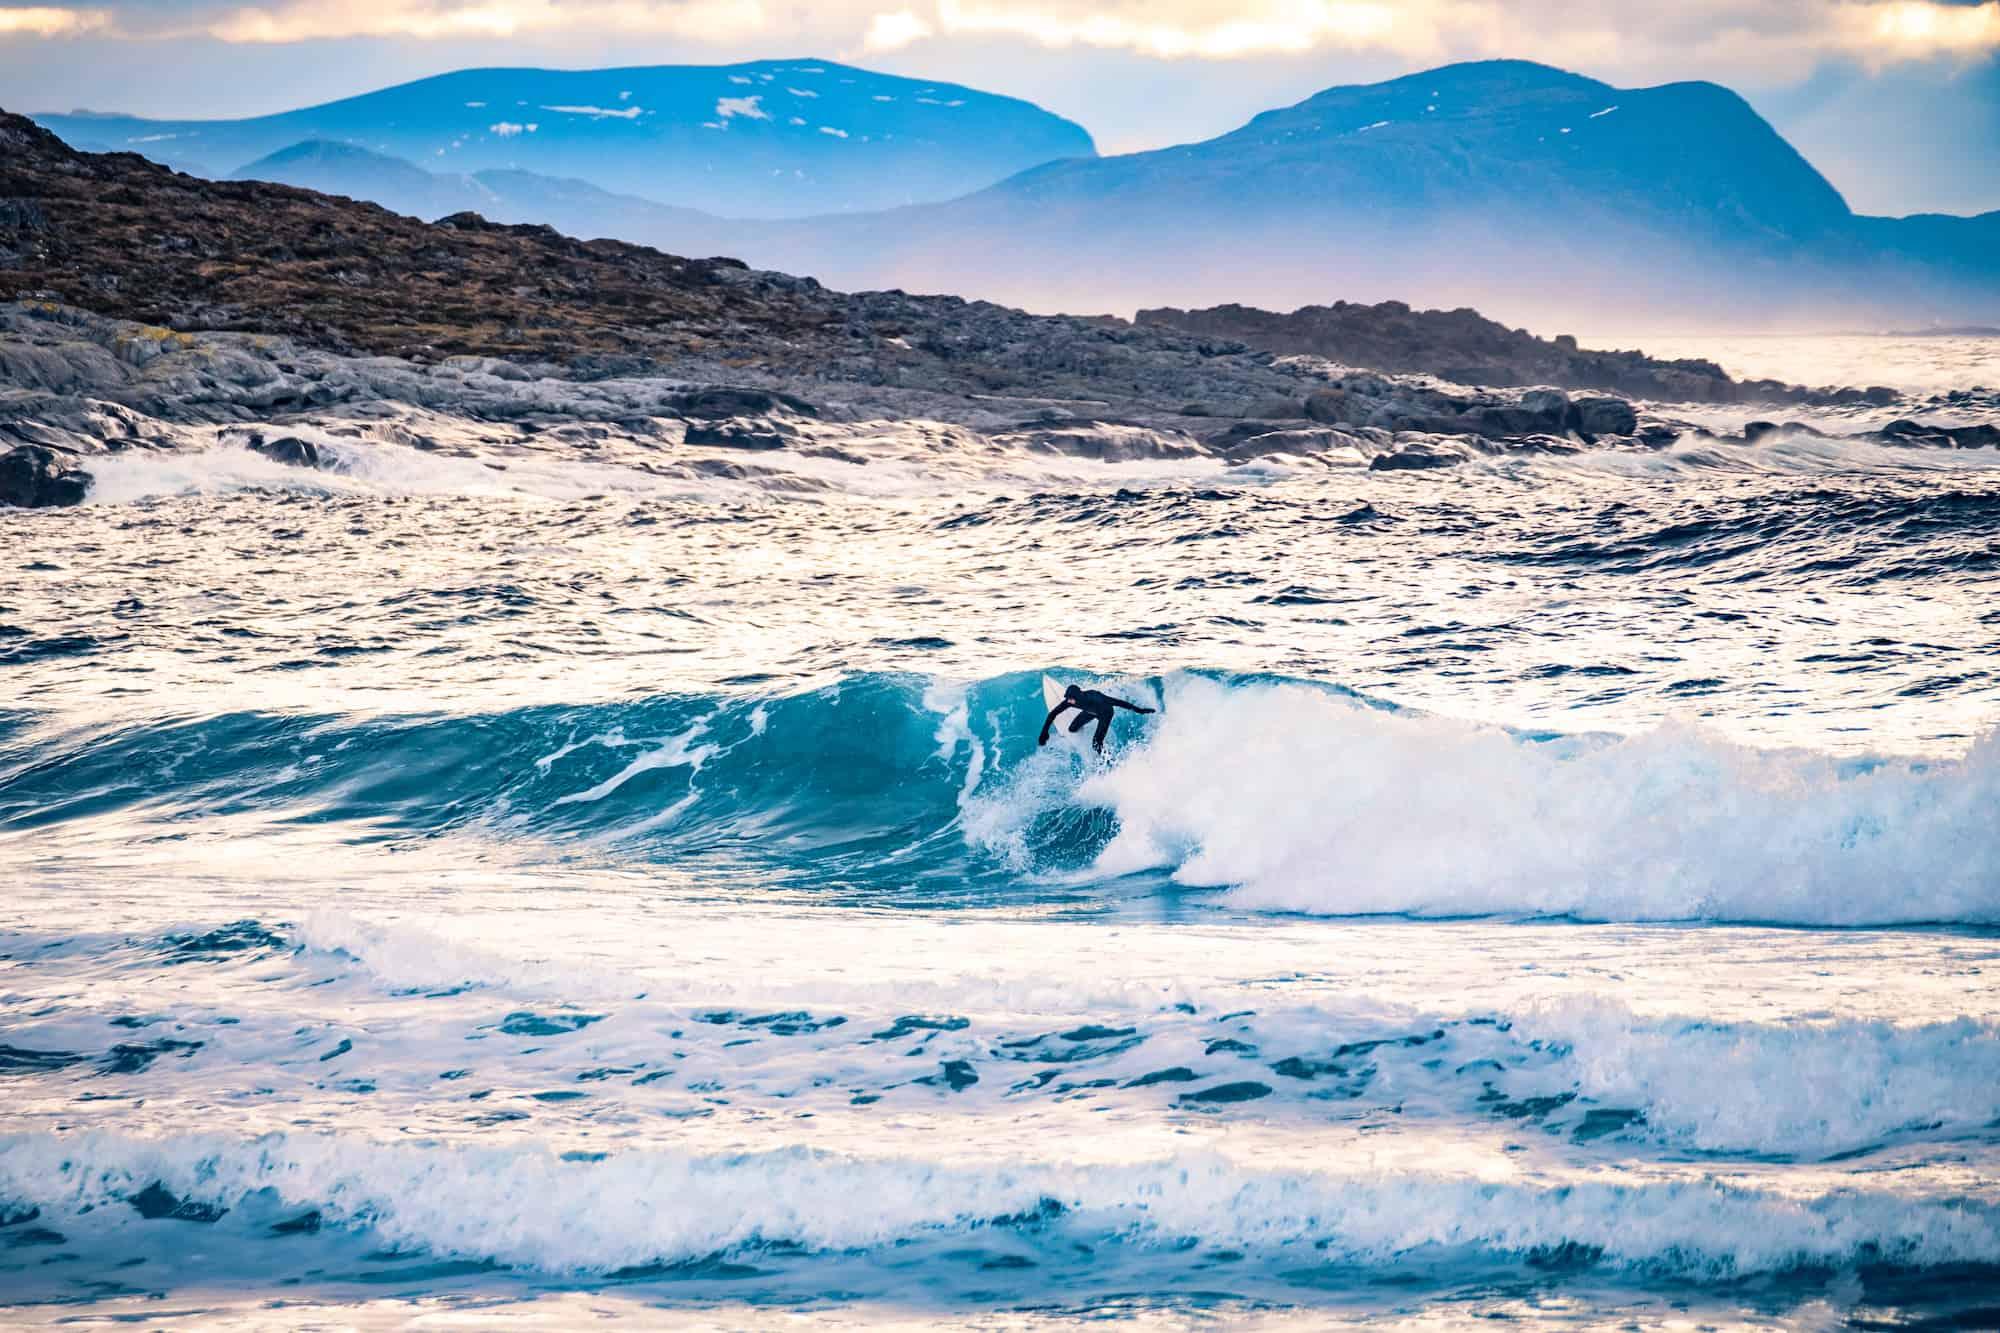 Bra bølger i Ålesund